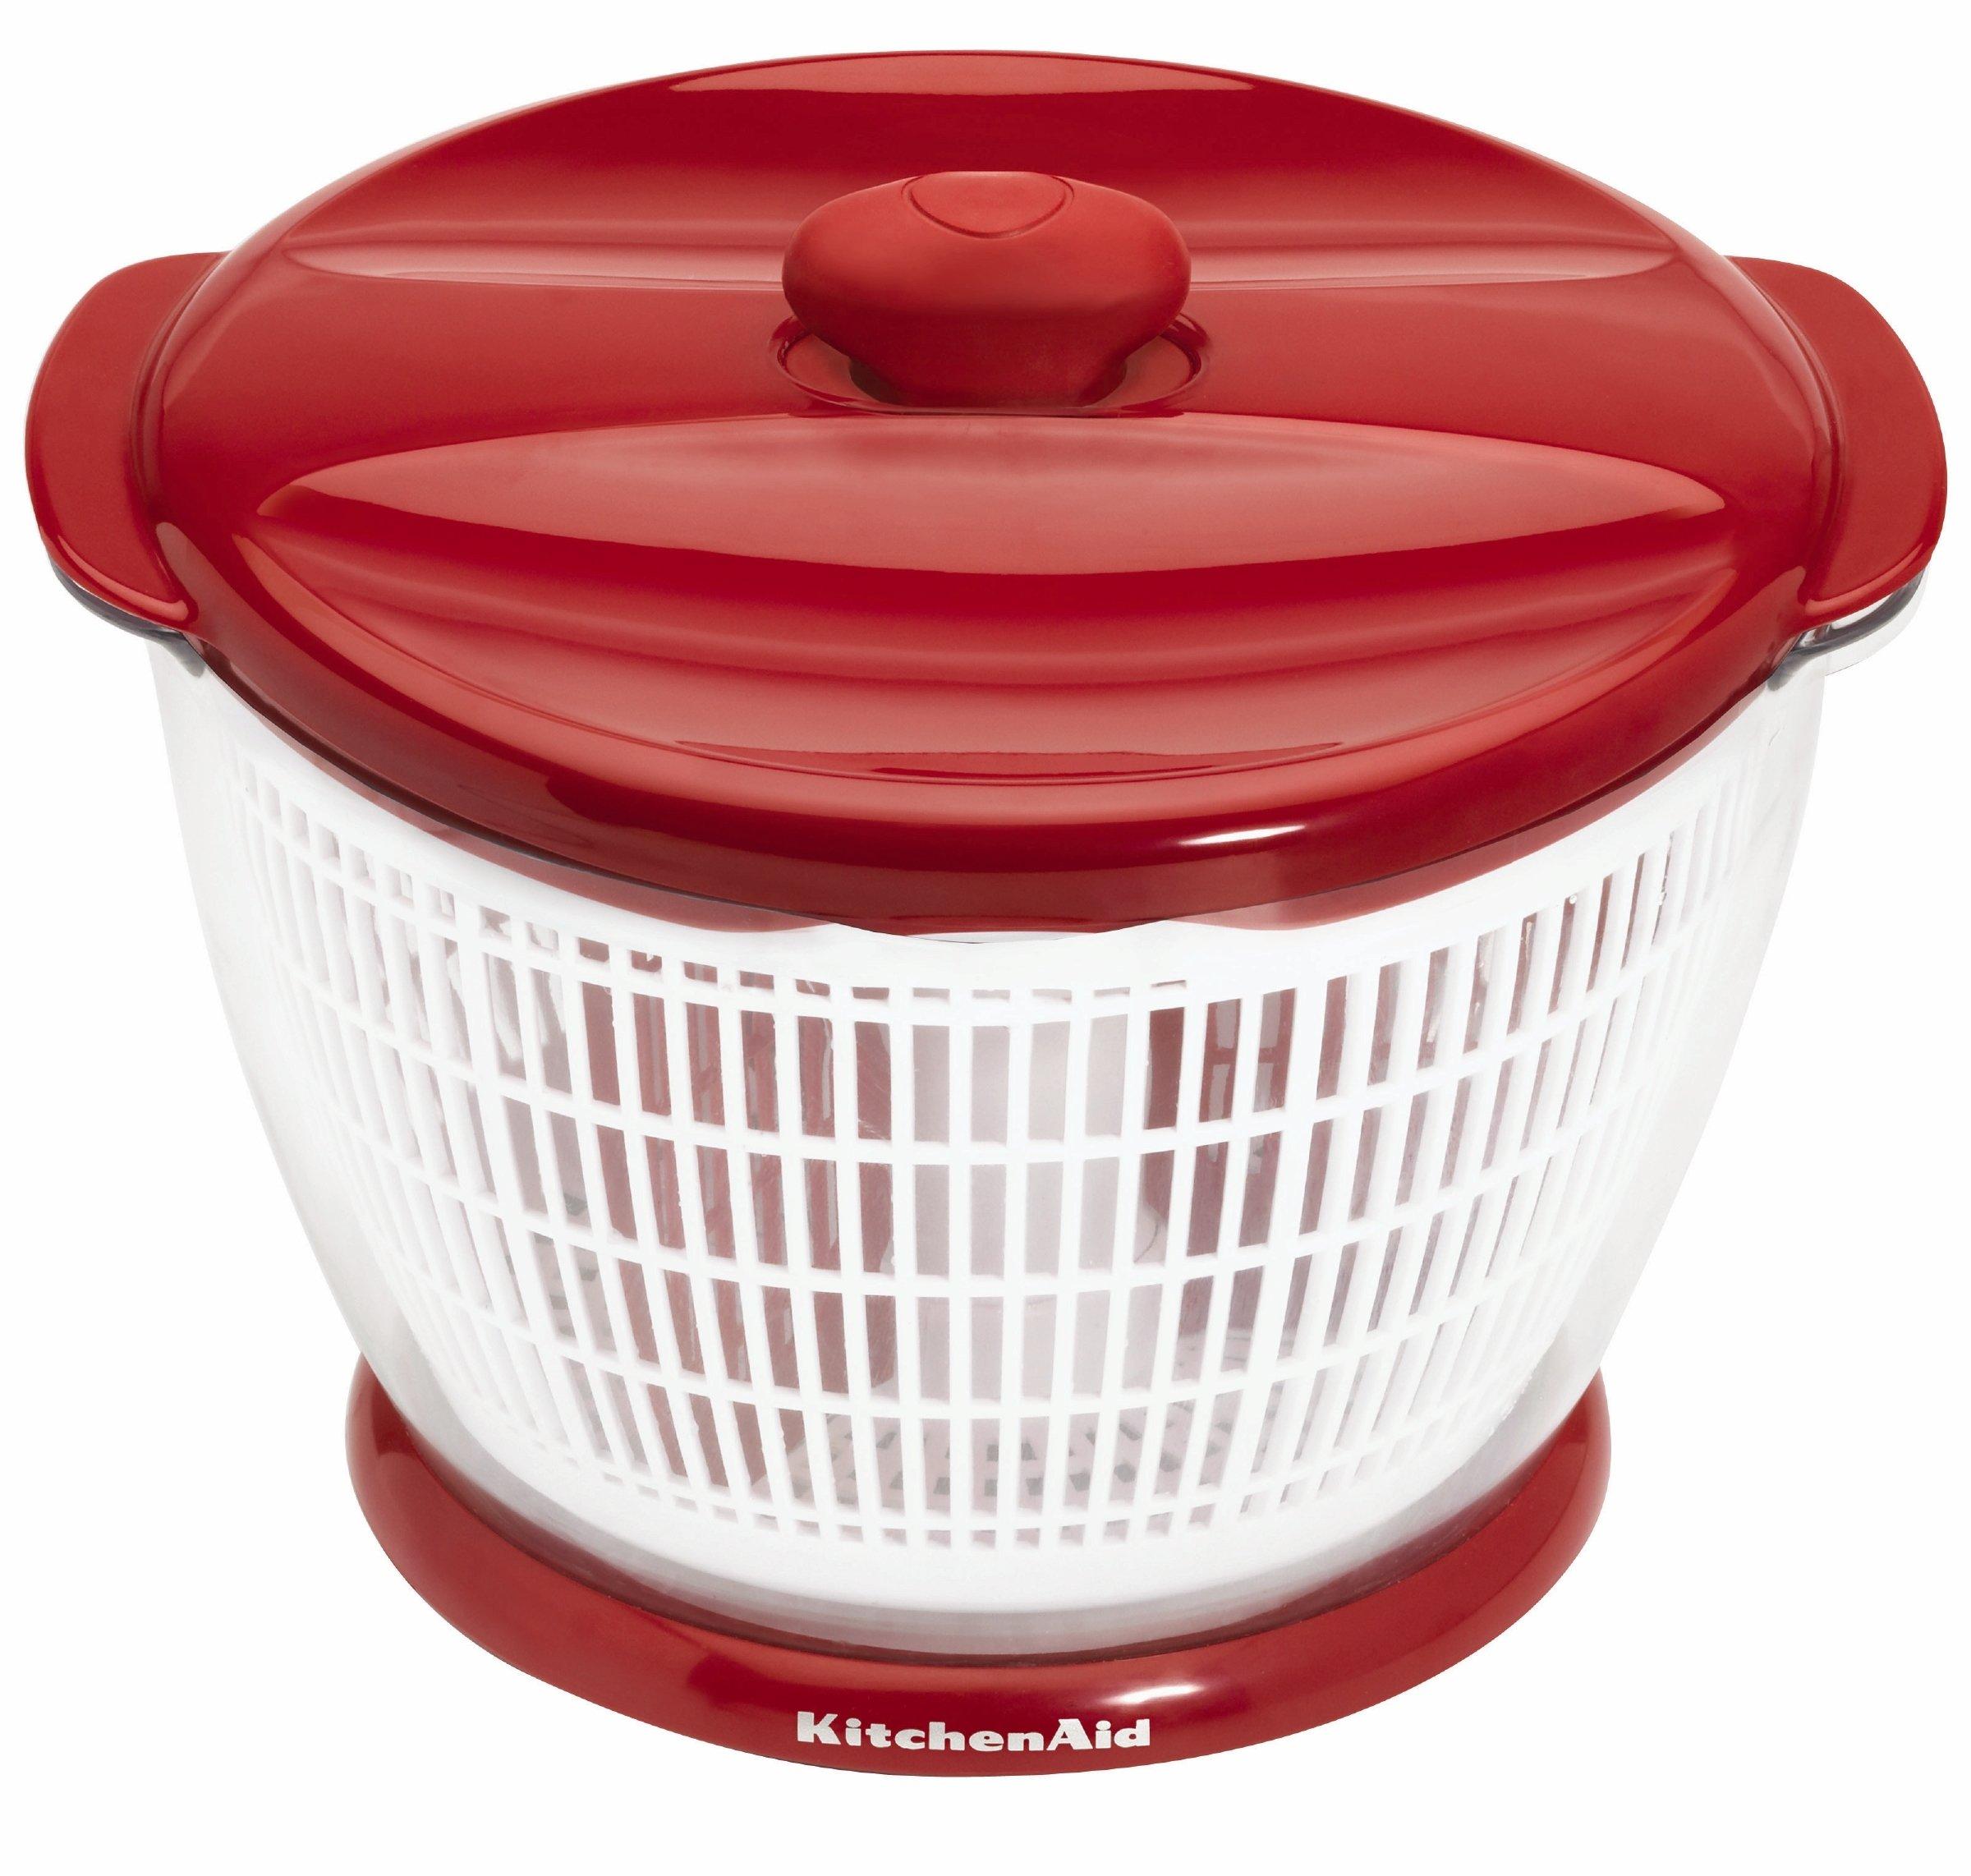 KitchenAid Plastic Salad Spinner (Red) by KitchenAid